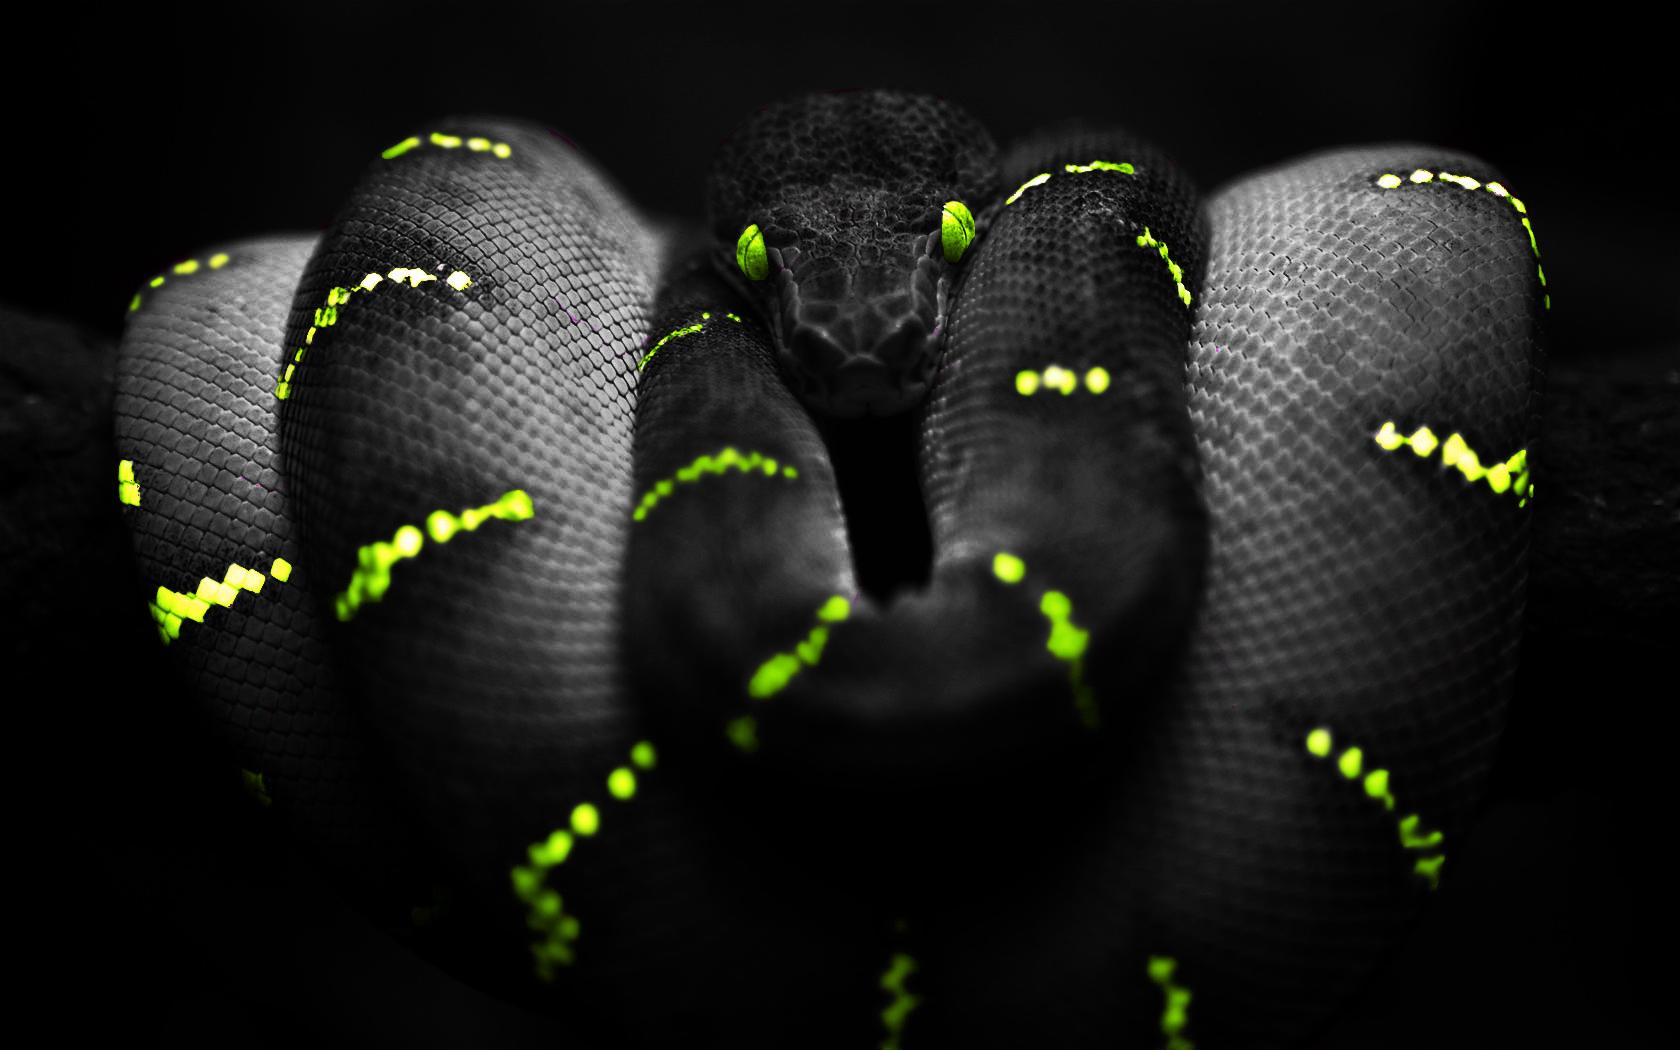 snake hd image